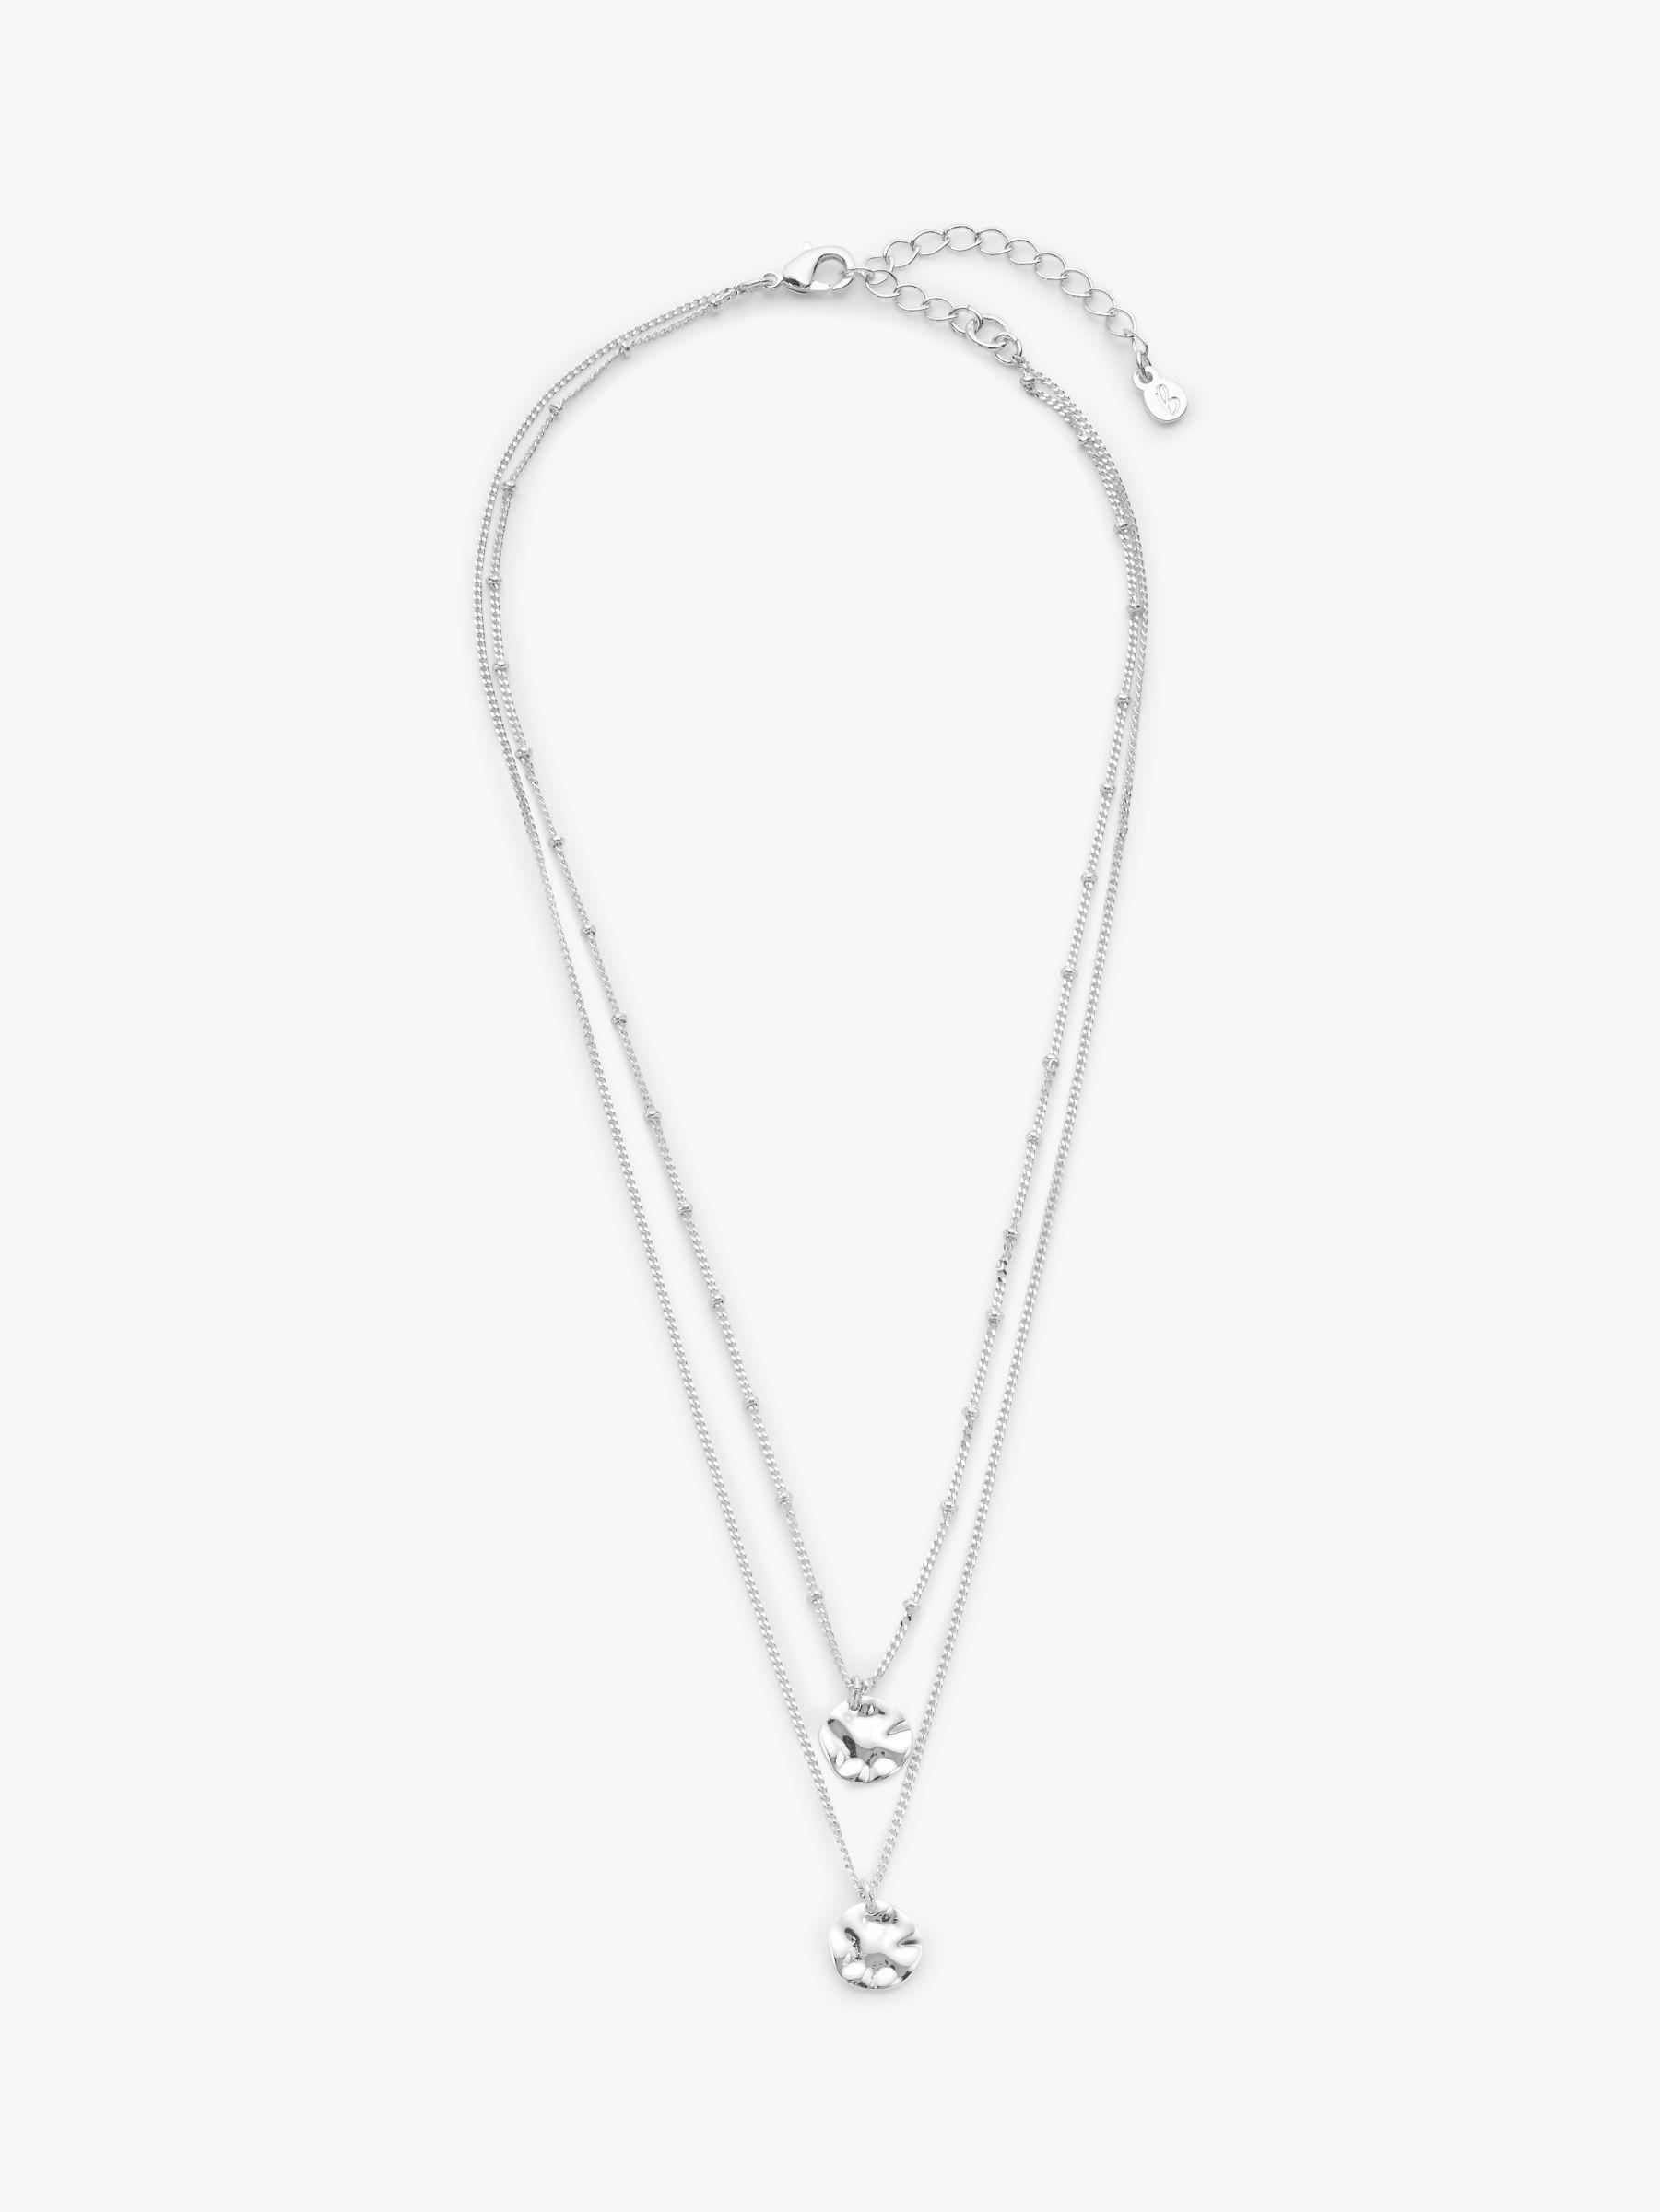 Boden Boden Demi Fine Layered Necklace, Silver